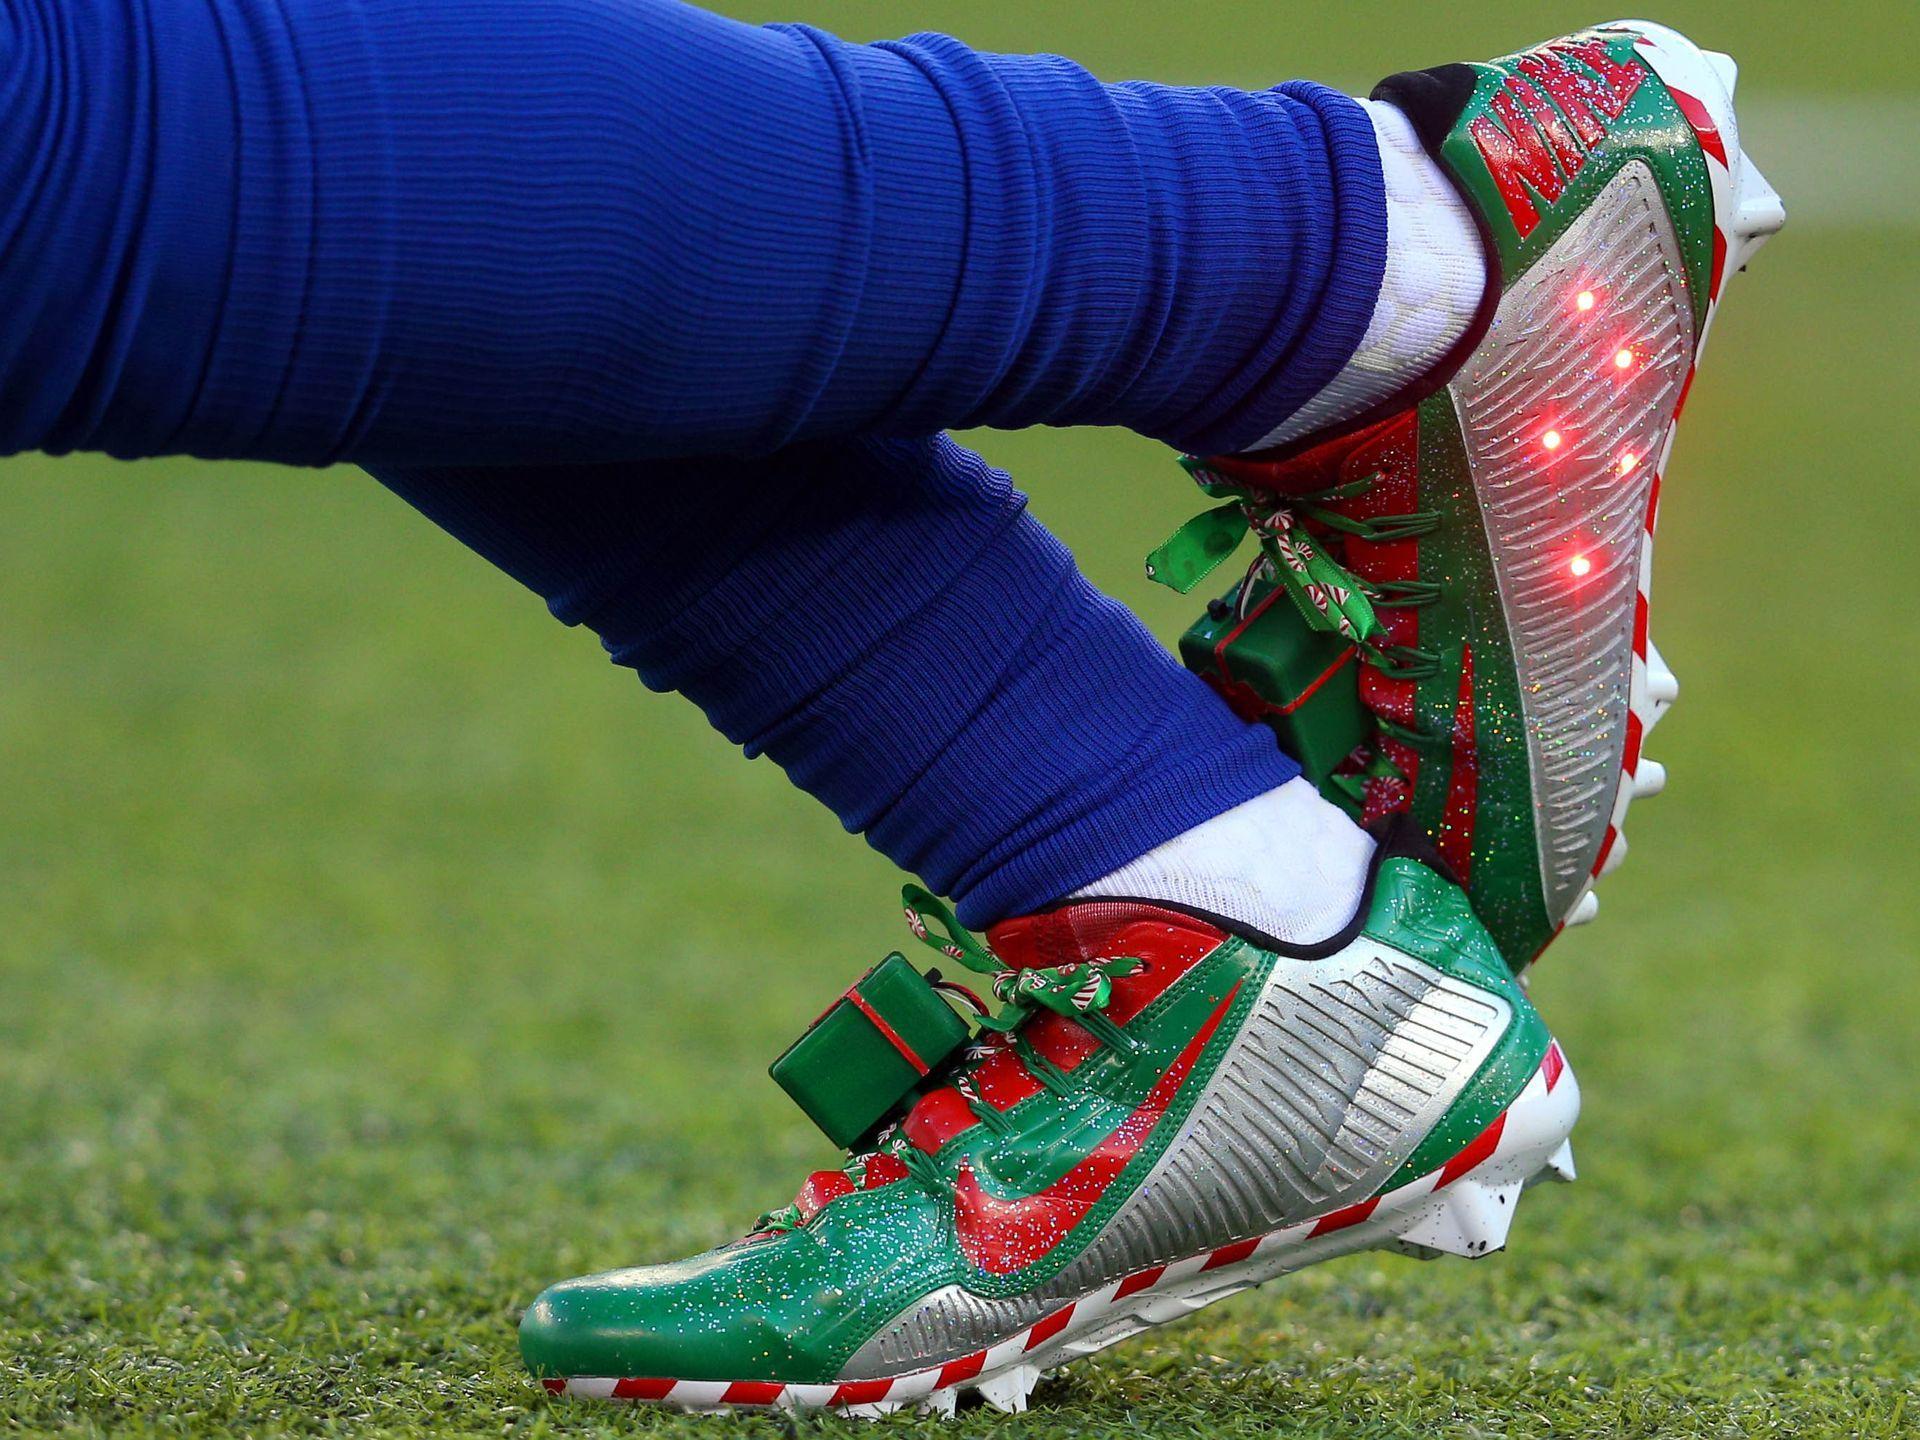 New York Giants wide receiver Odell Beckham Jr. wears Christmas ...